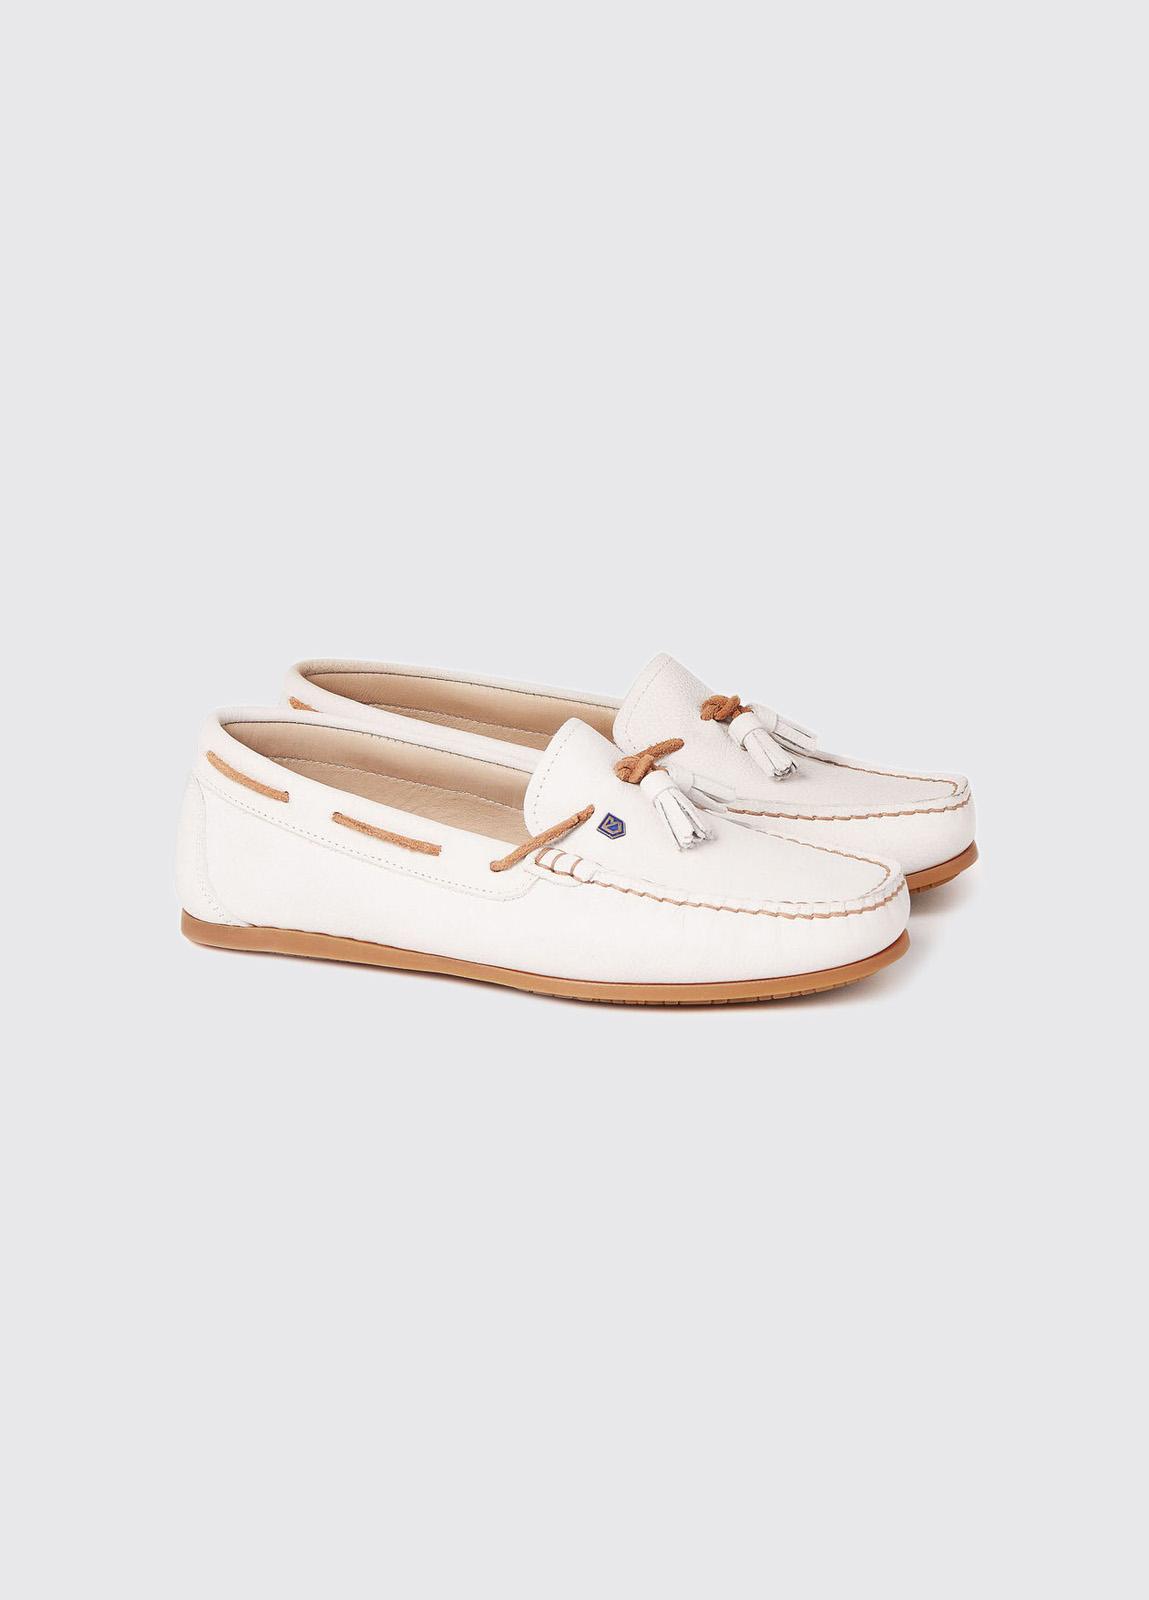 Jamaica Loafer - Sail White